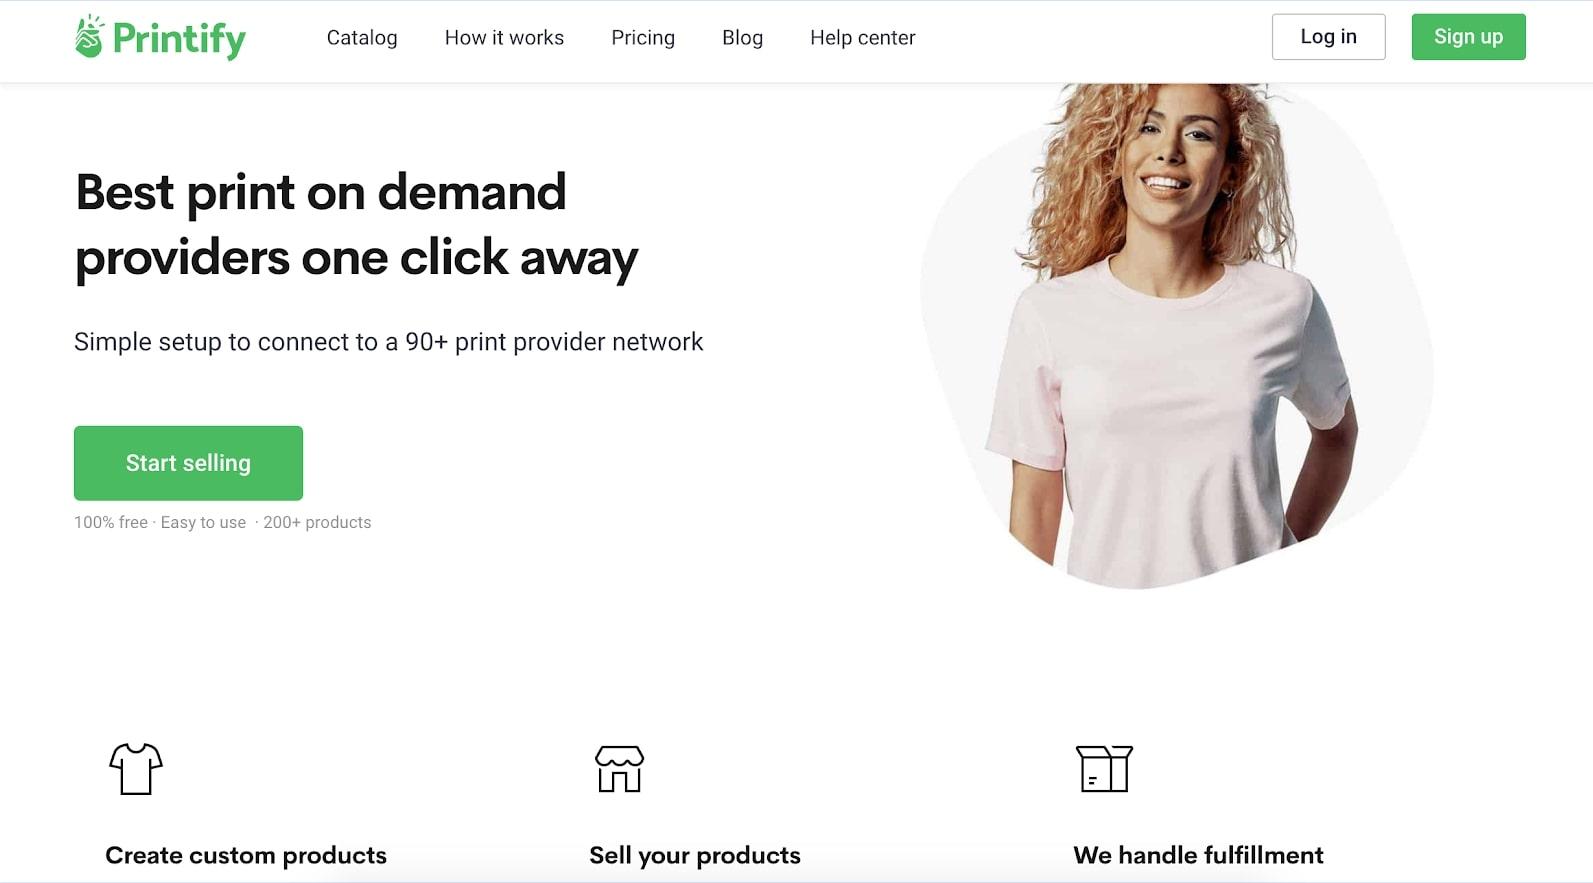 printify's website